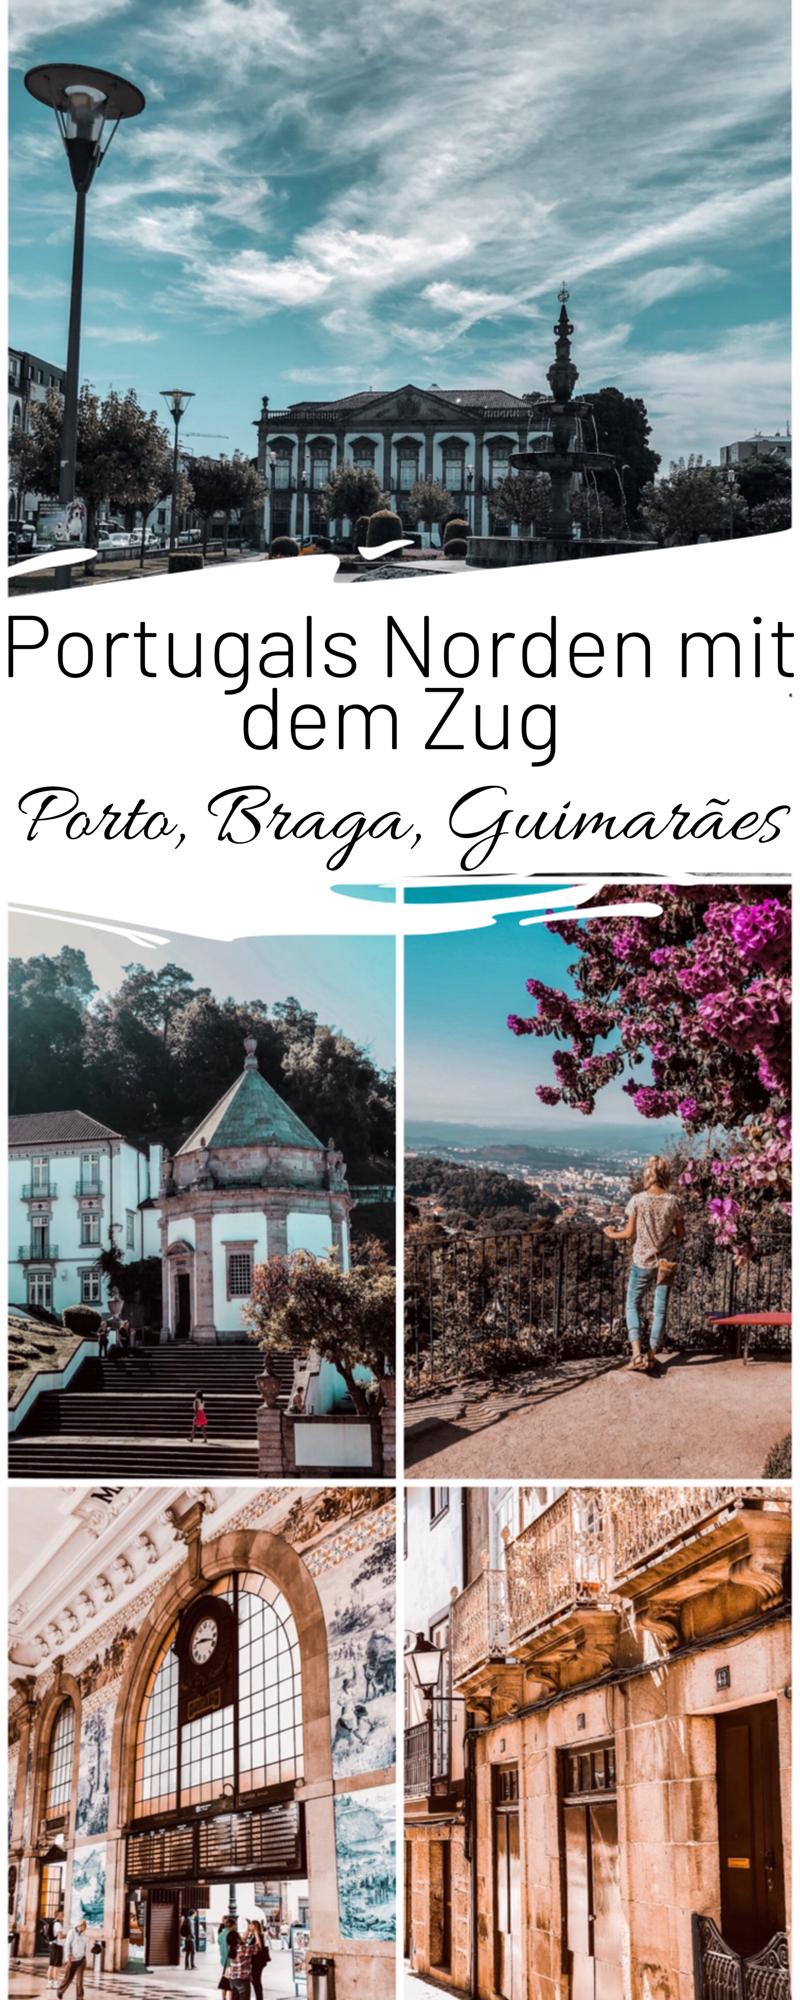 Nordportugal mit dem Zug - Braga, Guimarães & Porto ⋆ Child & Compass